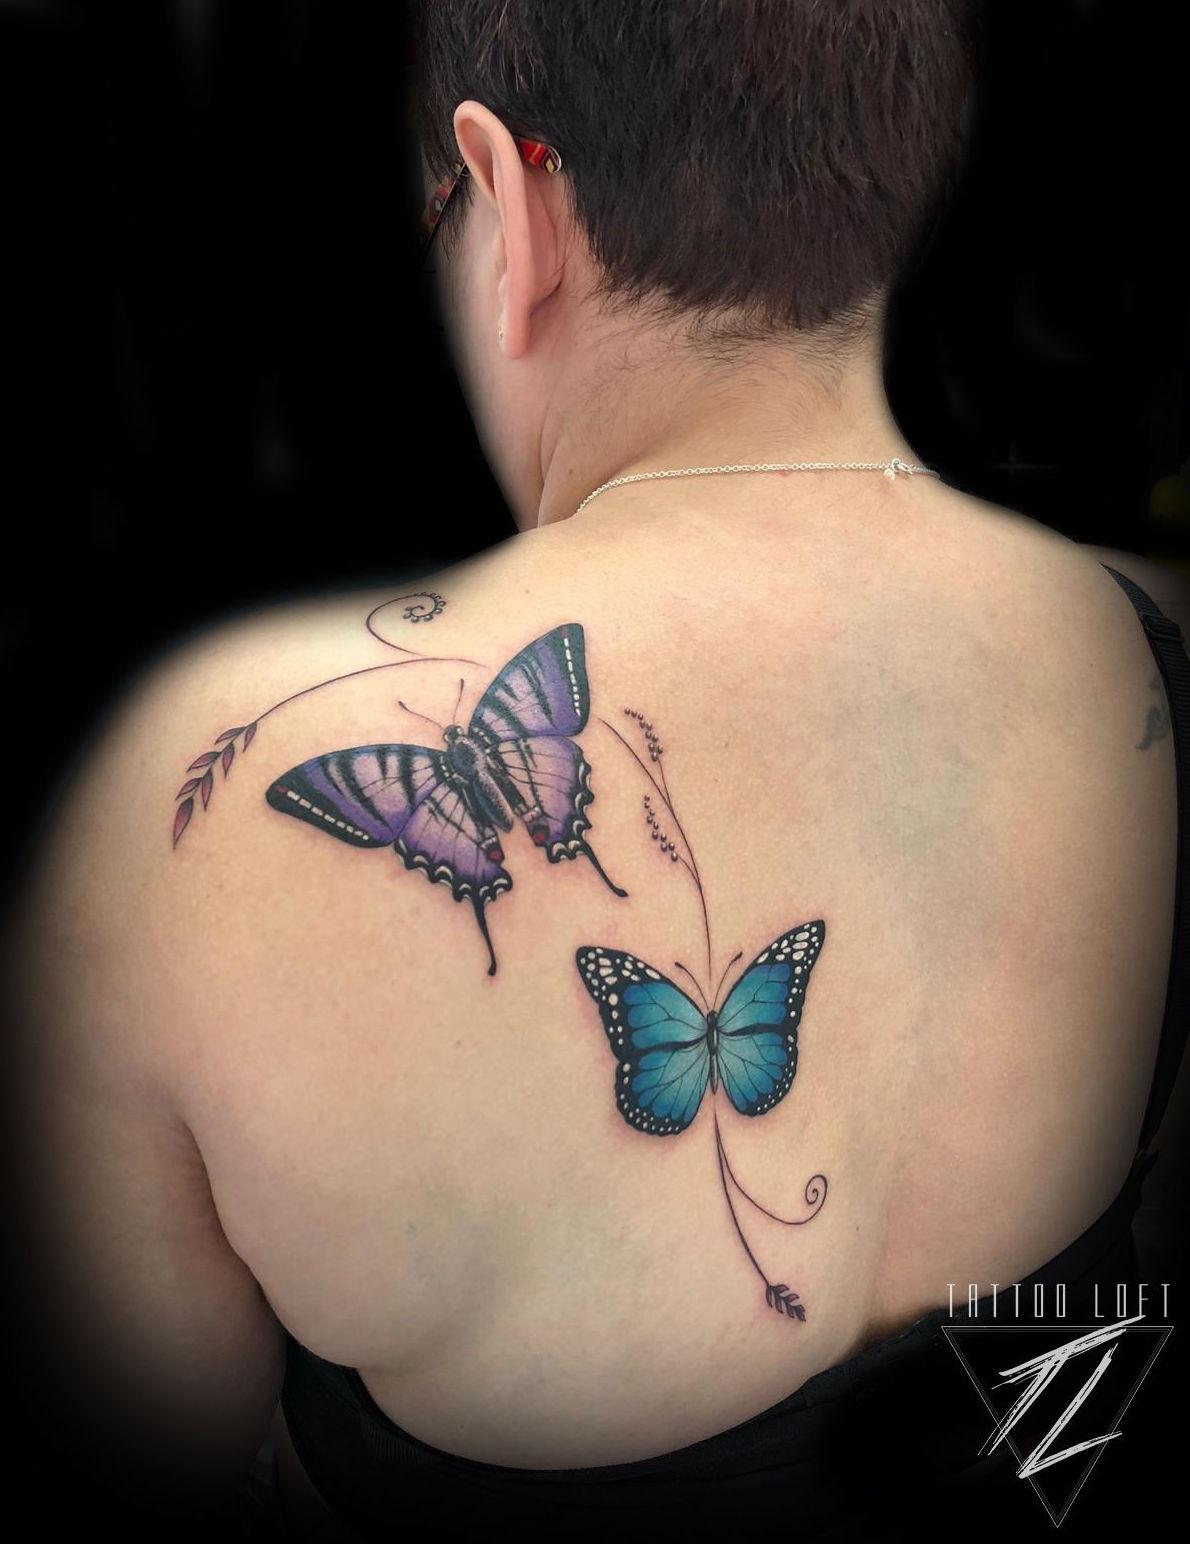 Foto 11 de Estudio artístico de tatuaje en  | Tattoo Loft